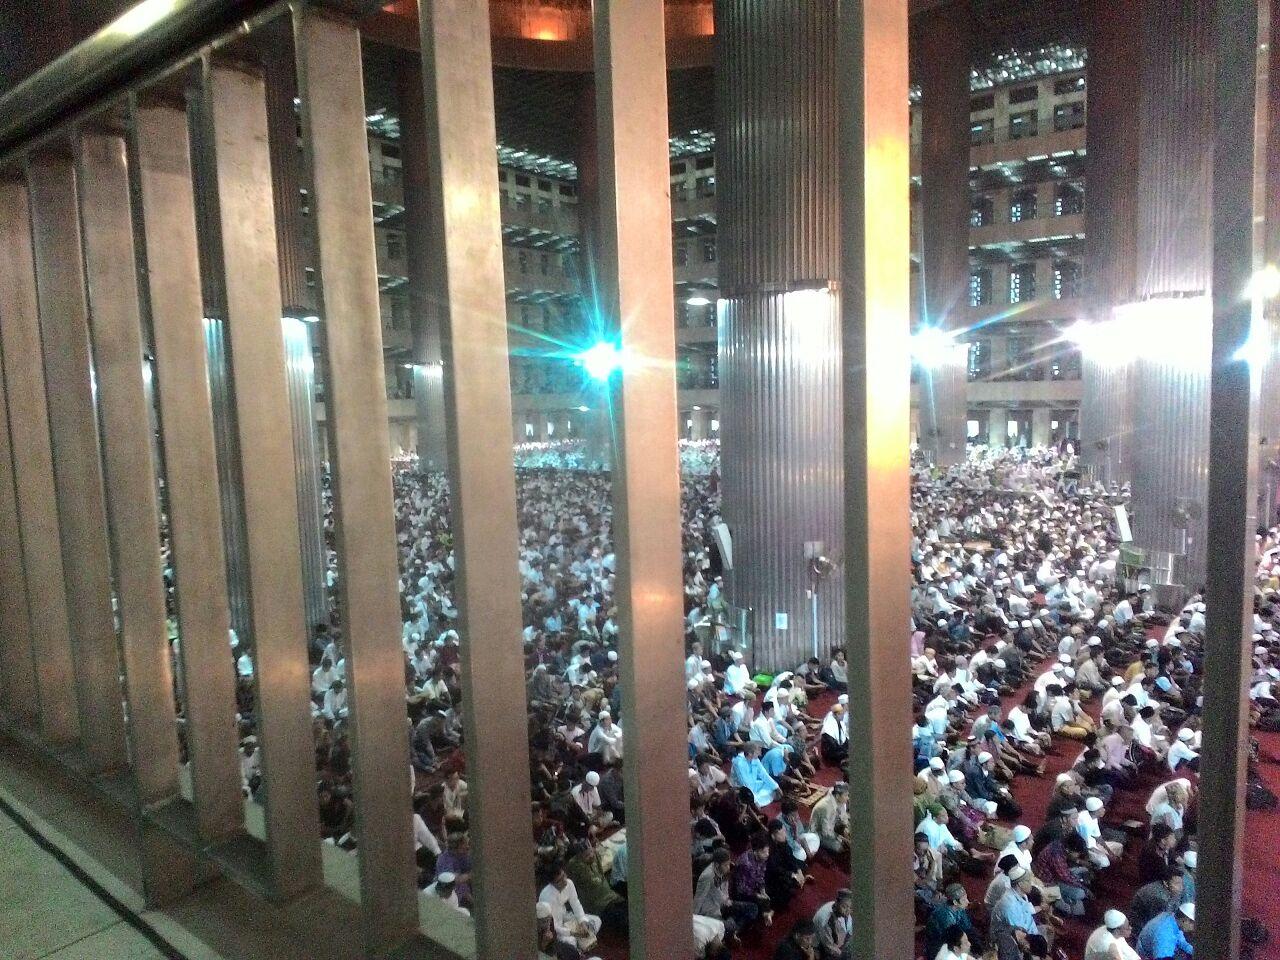 Ratusan Ribu Jamaah Idul Adha Padati Masjid Istiqlal